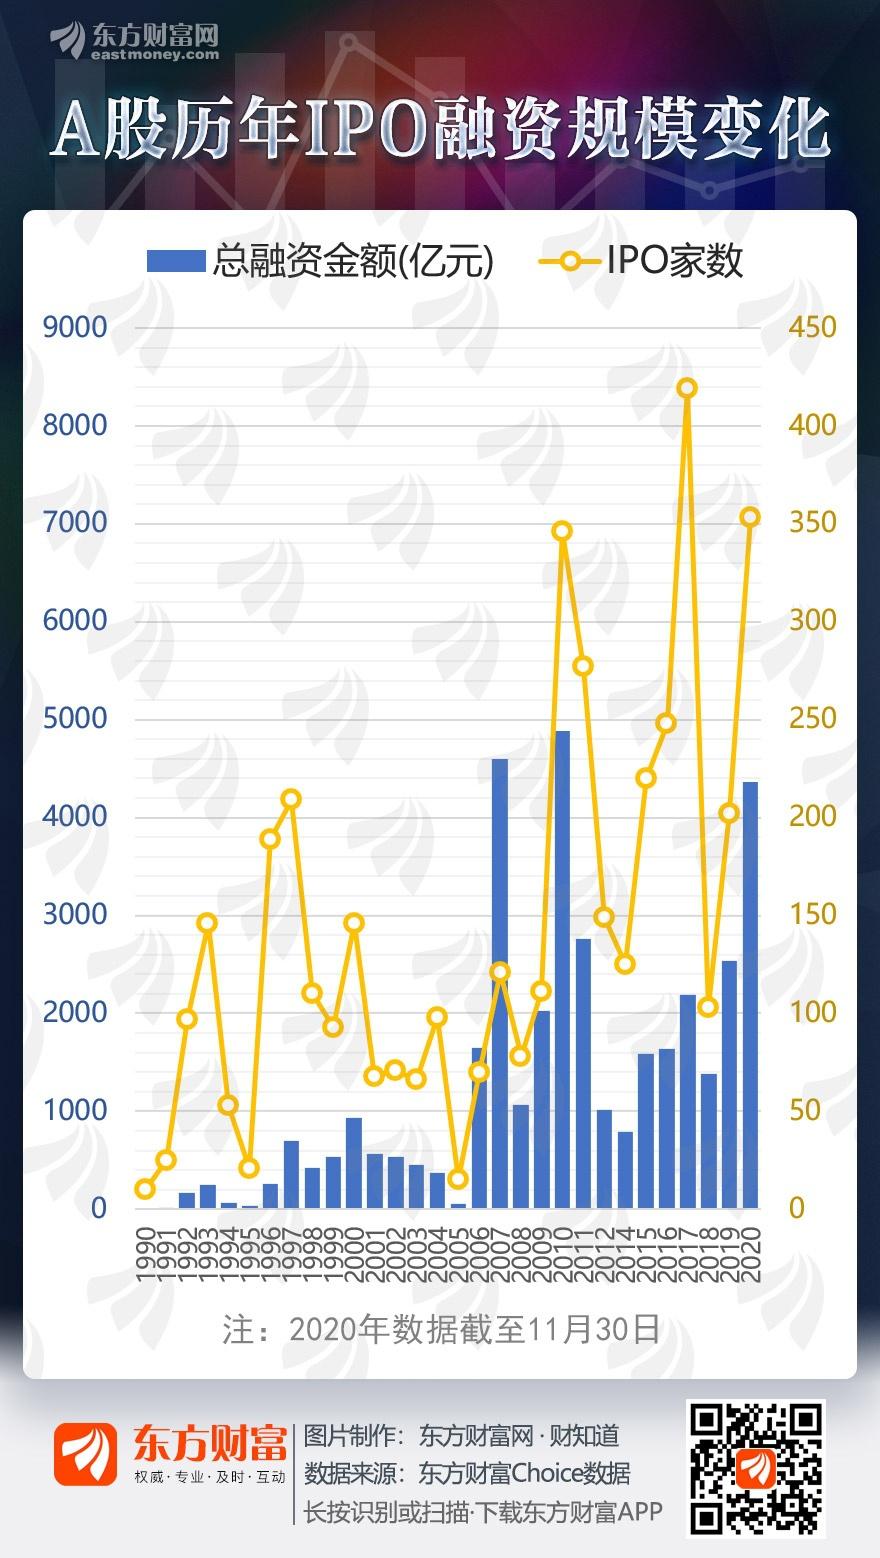 A股30年 今年IPO融资已超4000亿 一图回顾历年规模变化